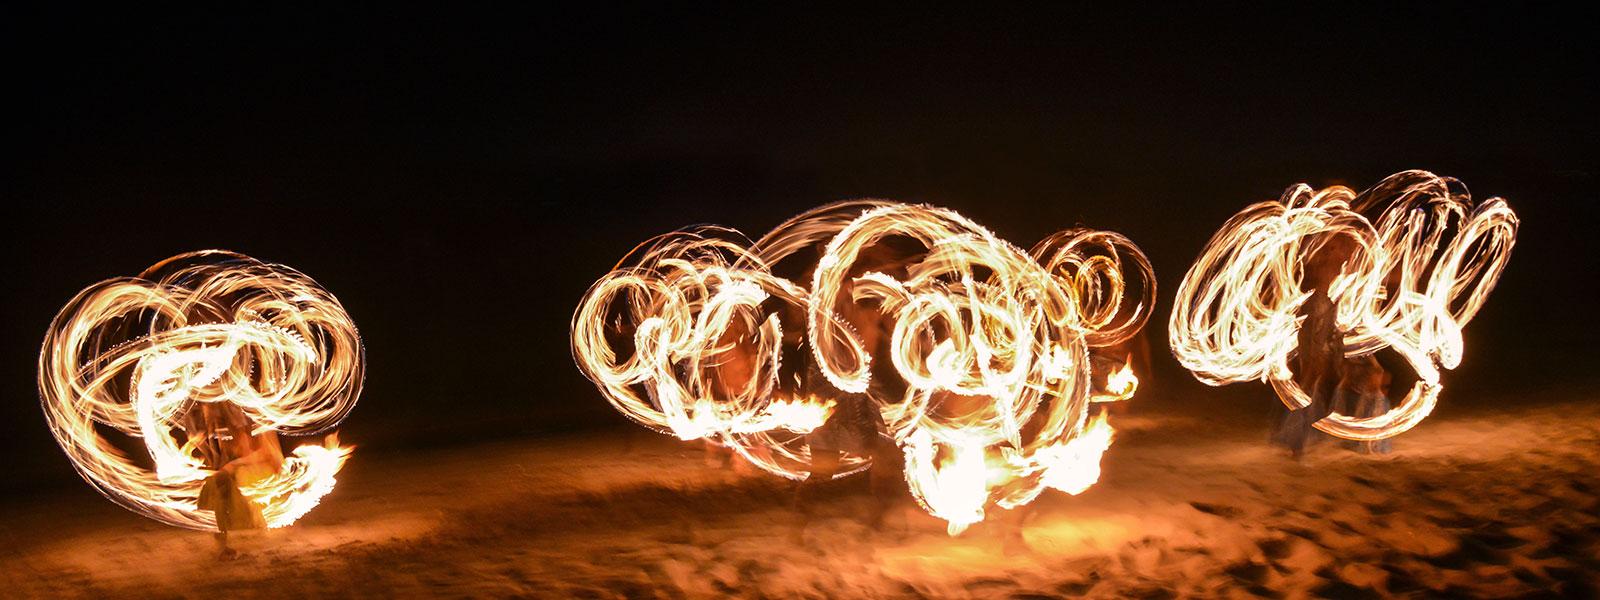 Fire dancers on the beach